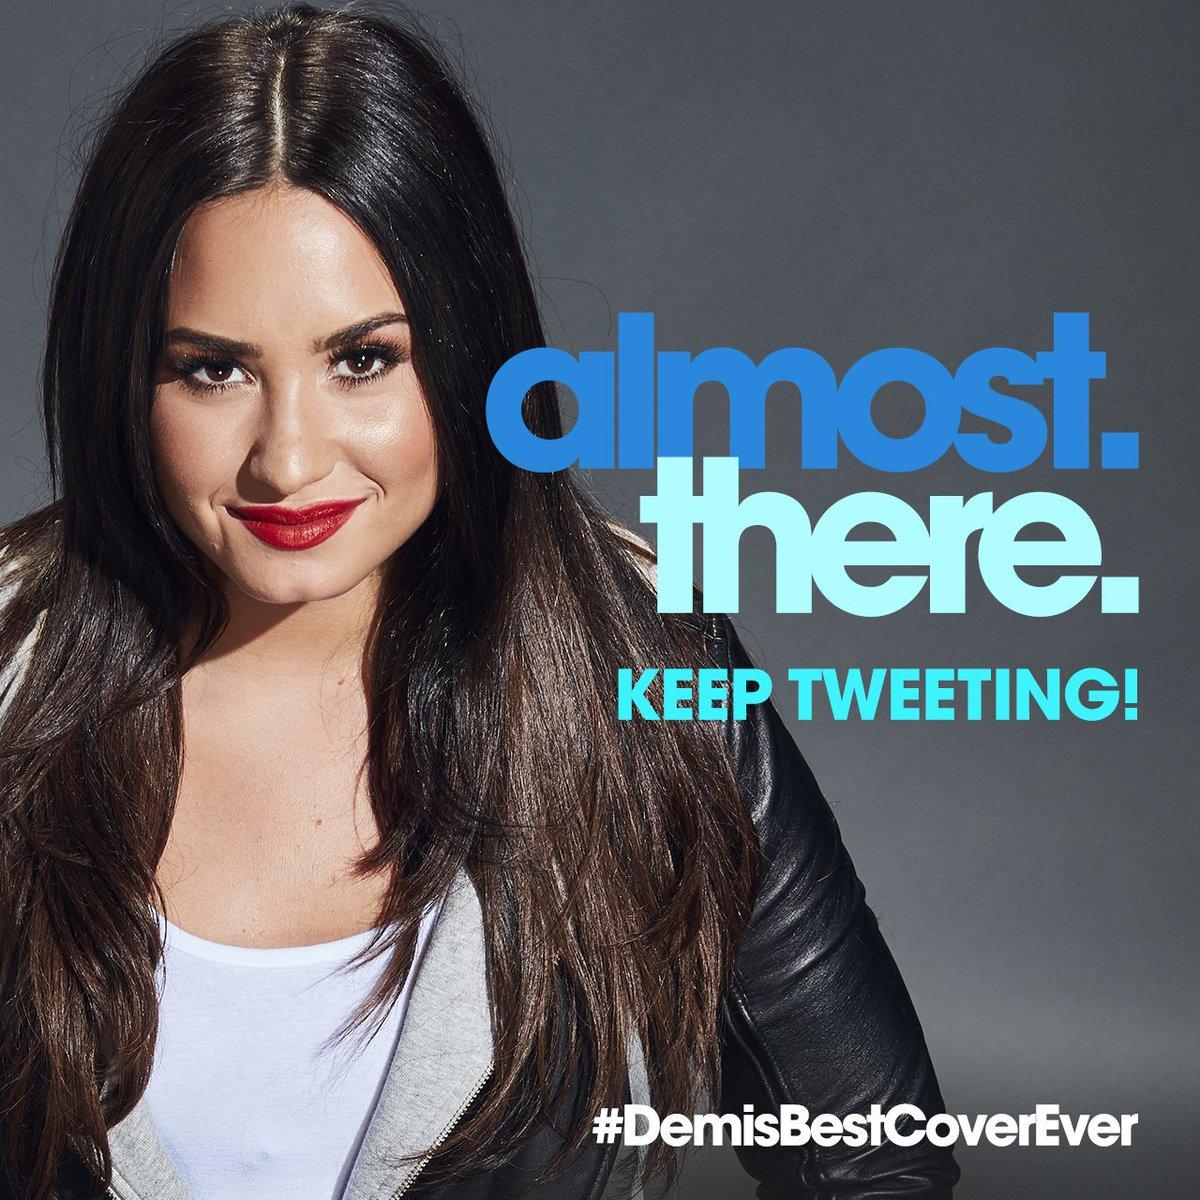 #DemisBestCoverEver is almost trending!...